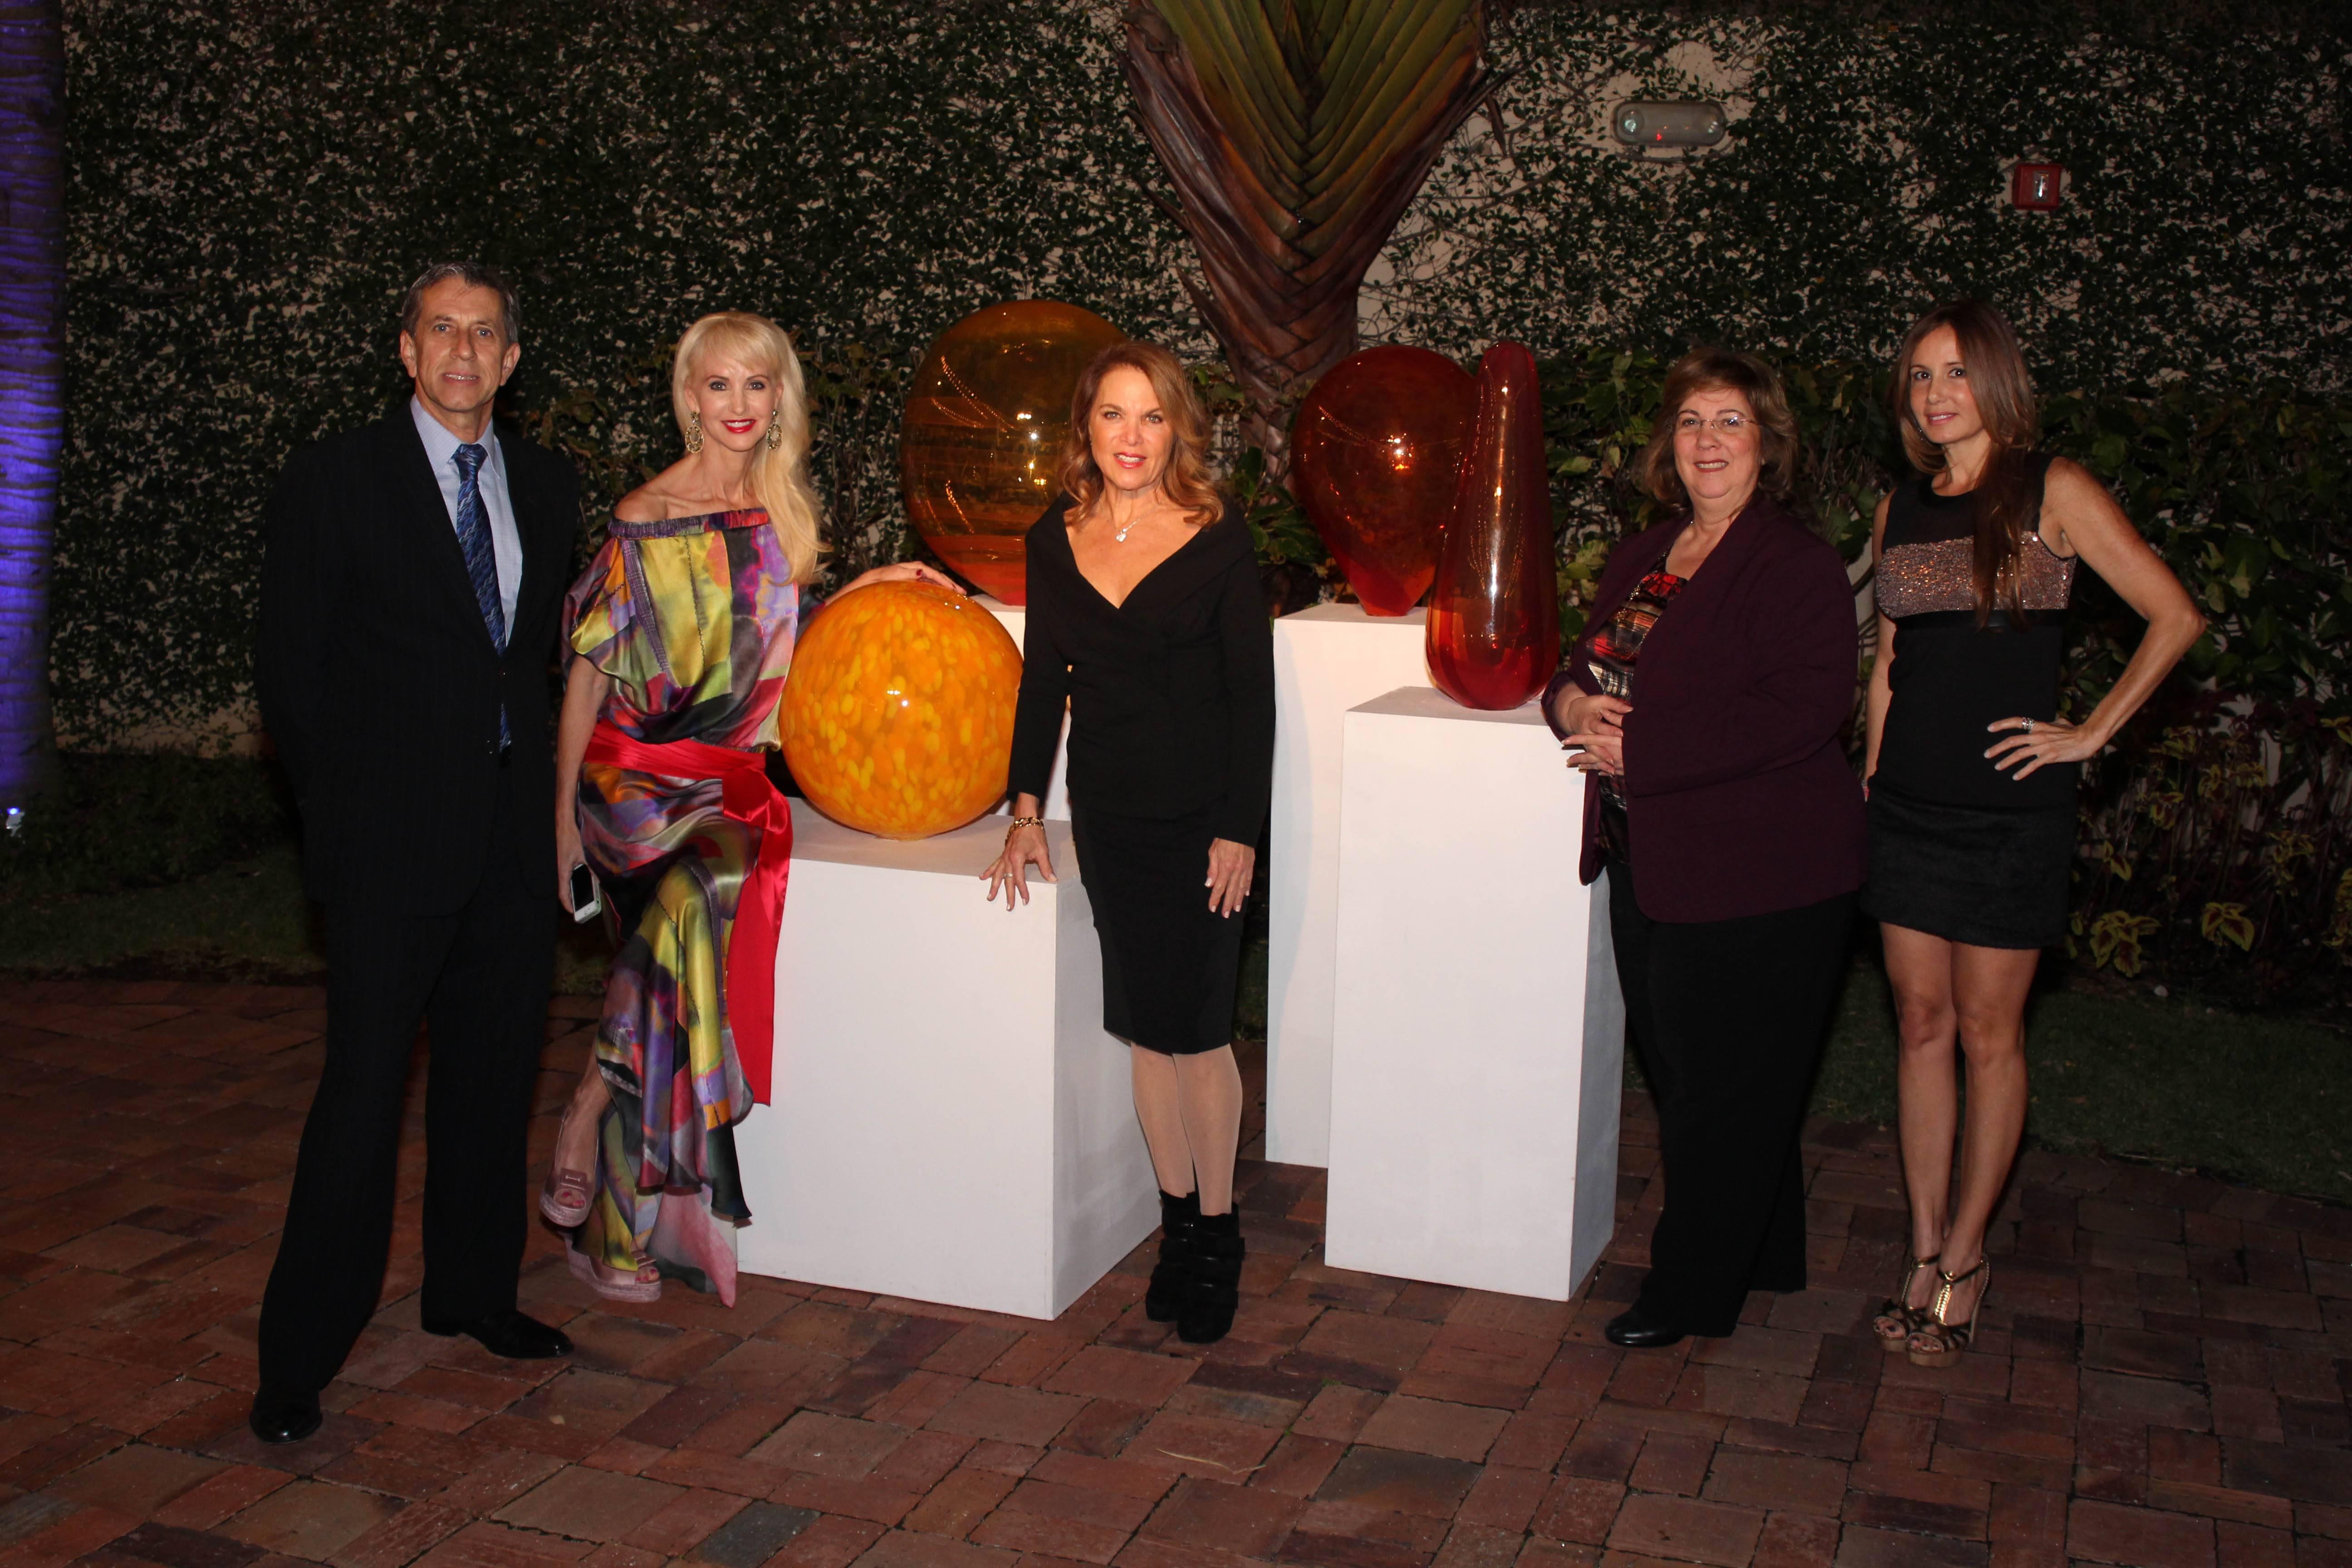 Fabian Gacia-Diaz, Katrina Peebles, Jill Elber, Nancy Klock Corey, Patricia Maurer (Scupture by Terje Lundaas, Seth Bertler Gallery)